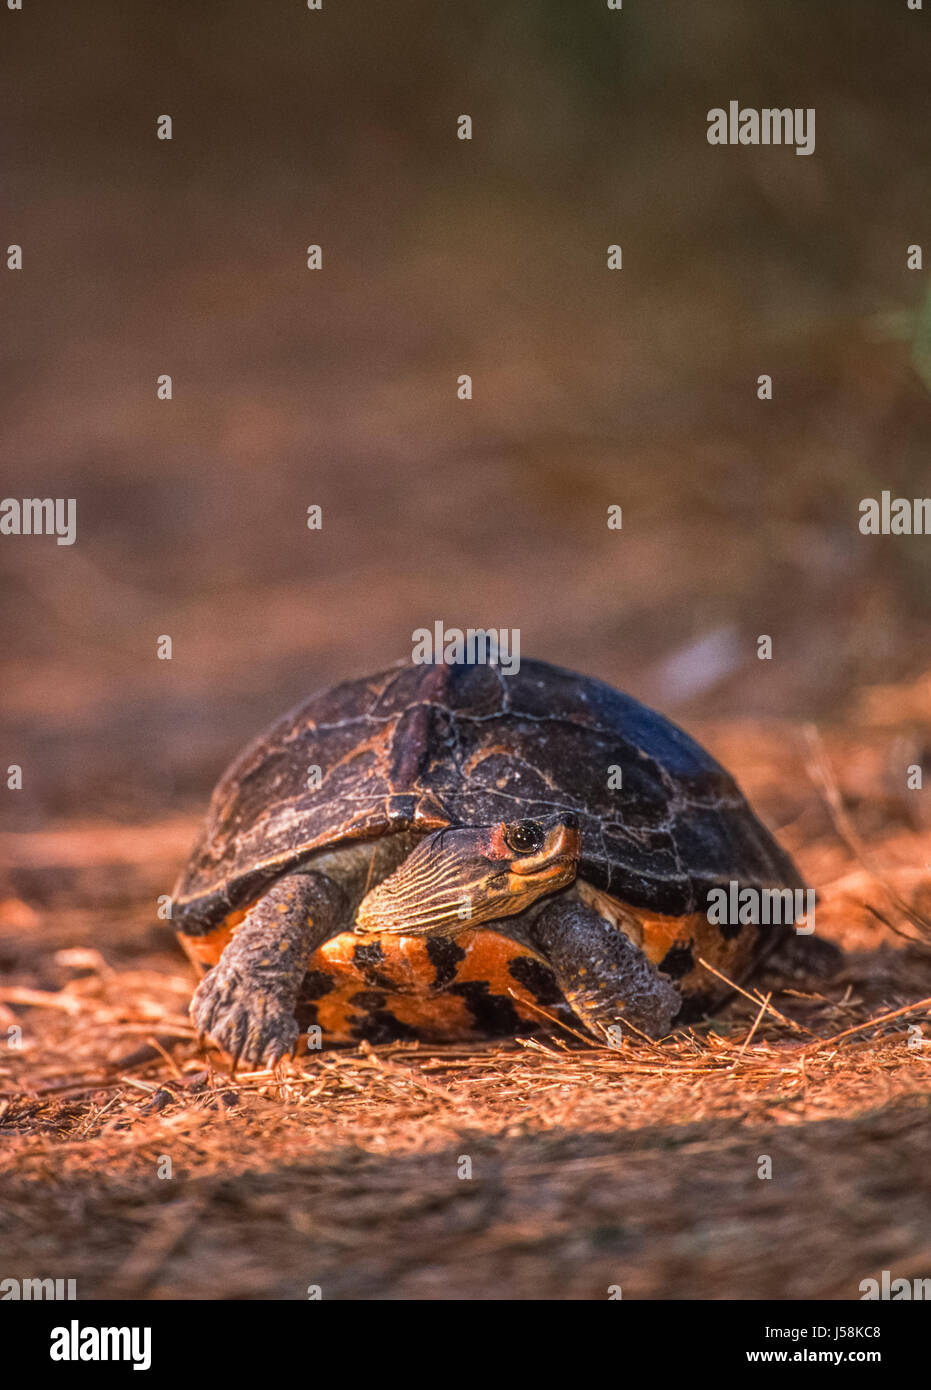 Indian roofed turtle, (Kachuga tecta), Keoladeo Ghana National Park, Bharatpur, Rajasthan, India - Stock Image